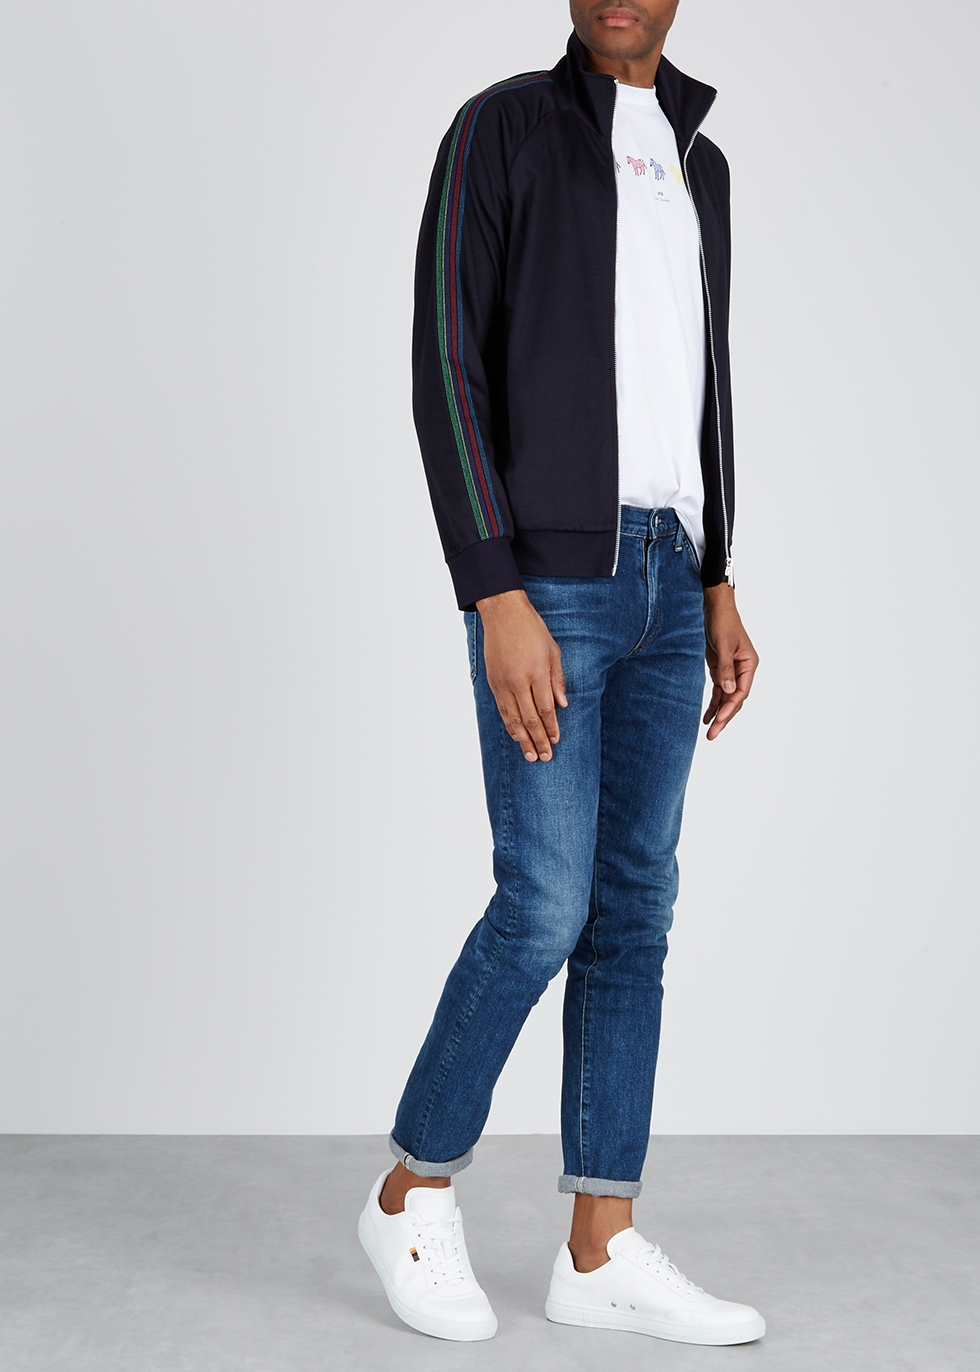 Navy cotton-blend sweatshirt - Paul Smith